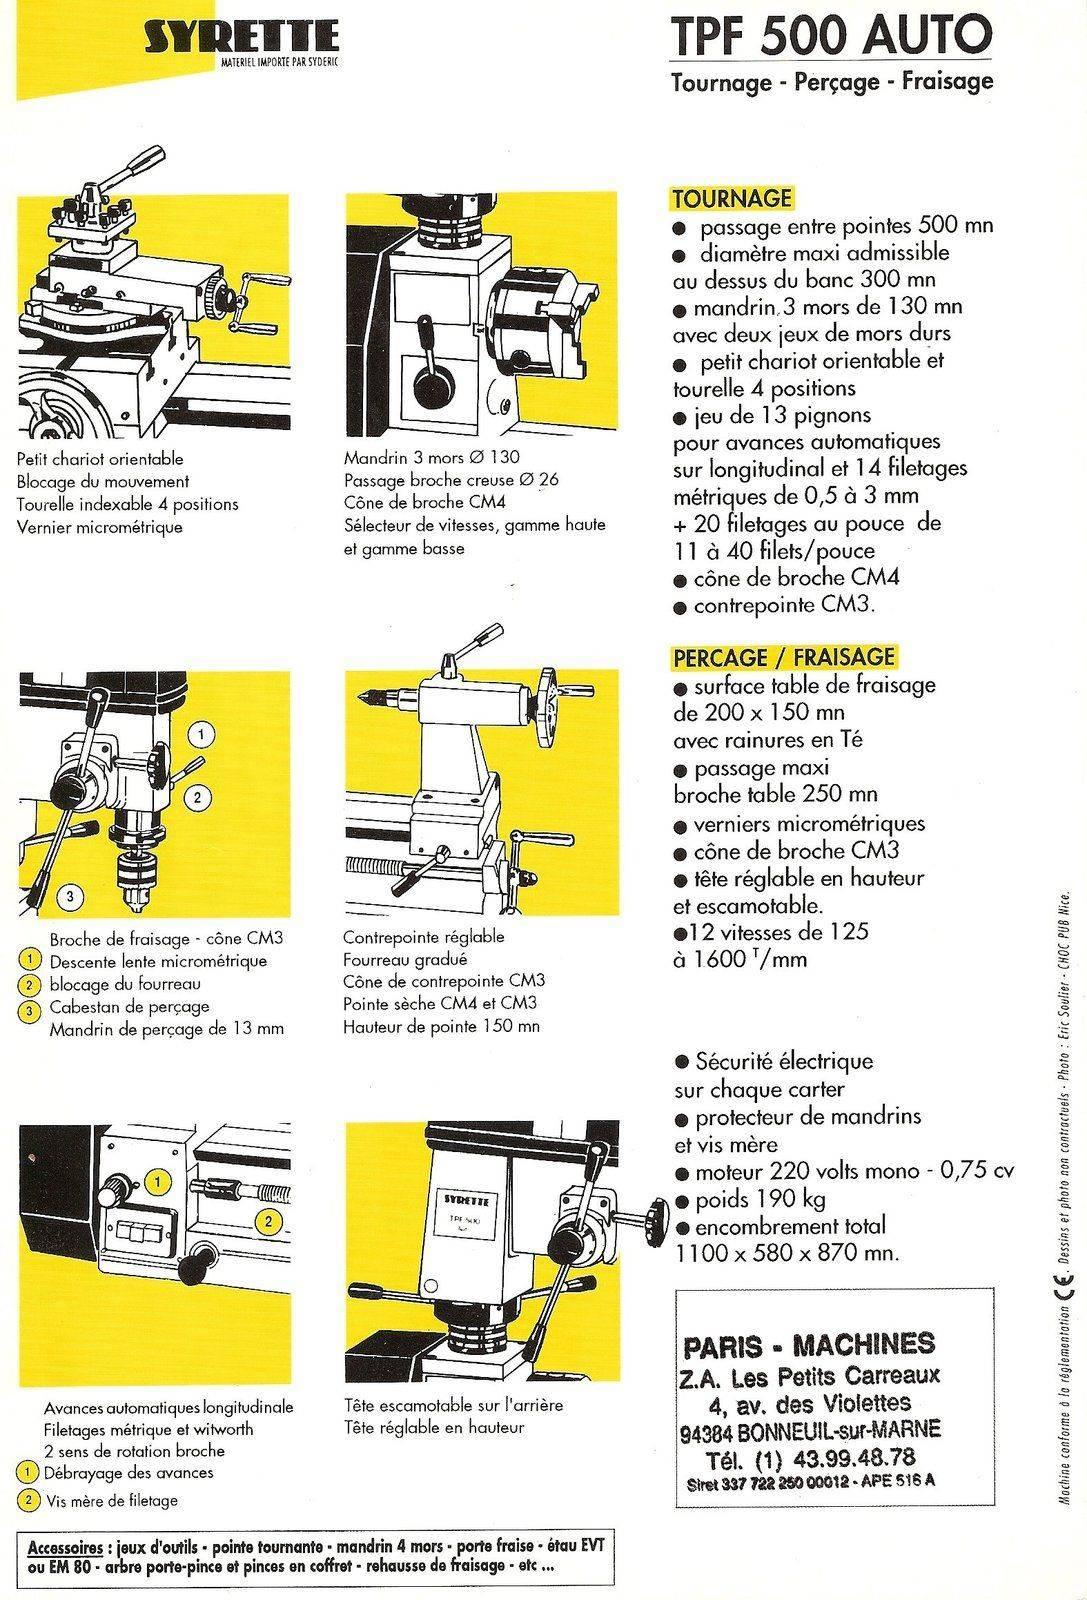 TPF500 2.jpg